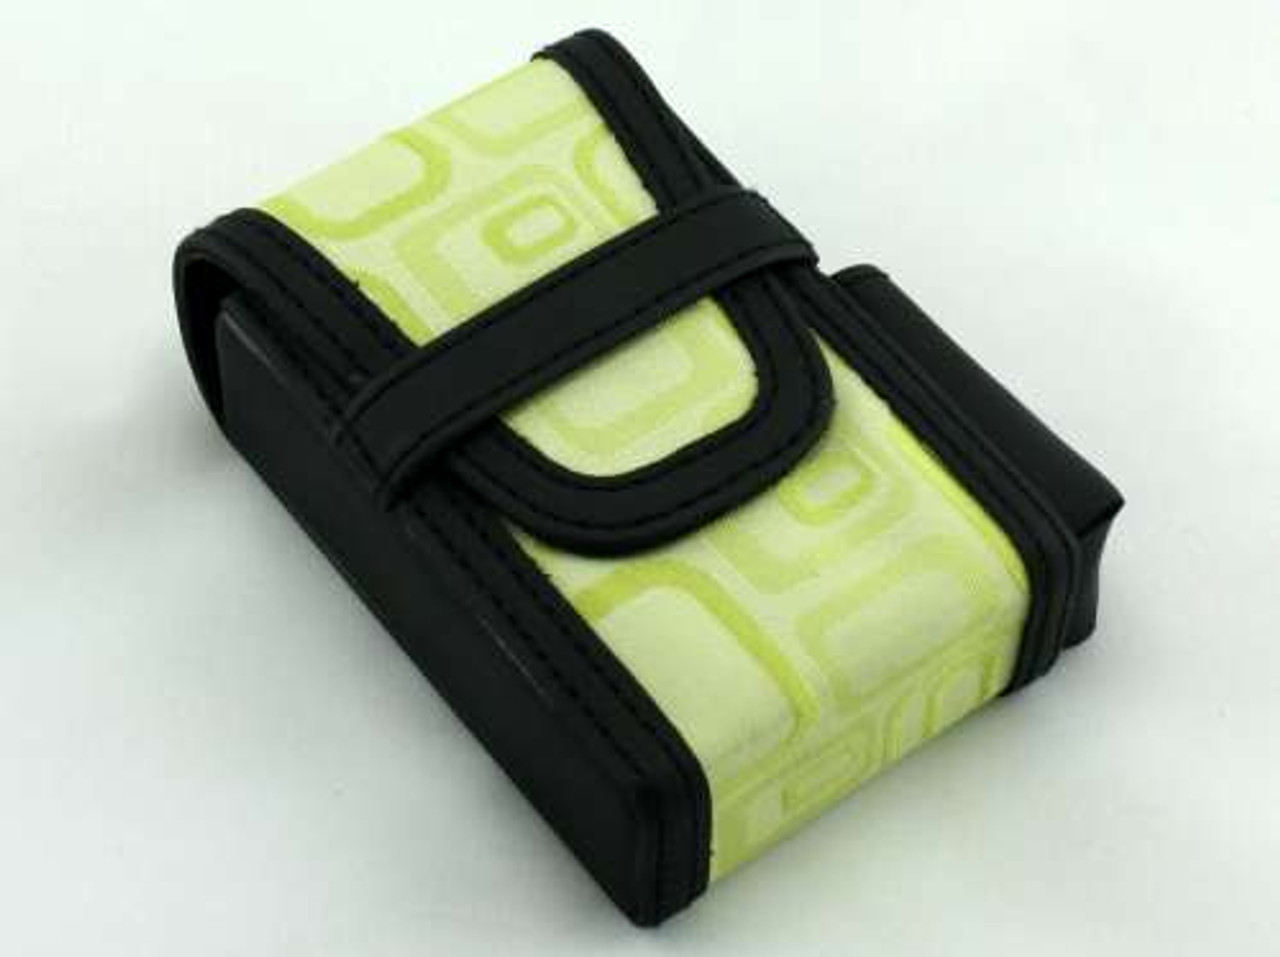 Green Halo Cigarette Pack Holder